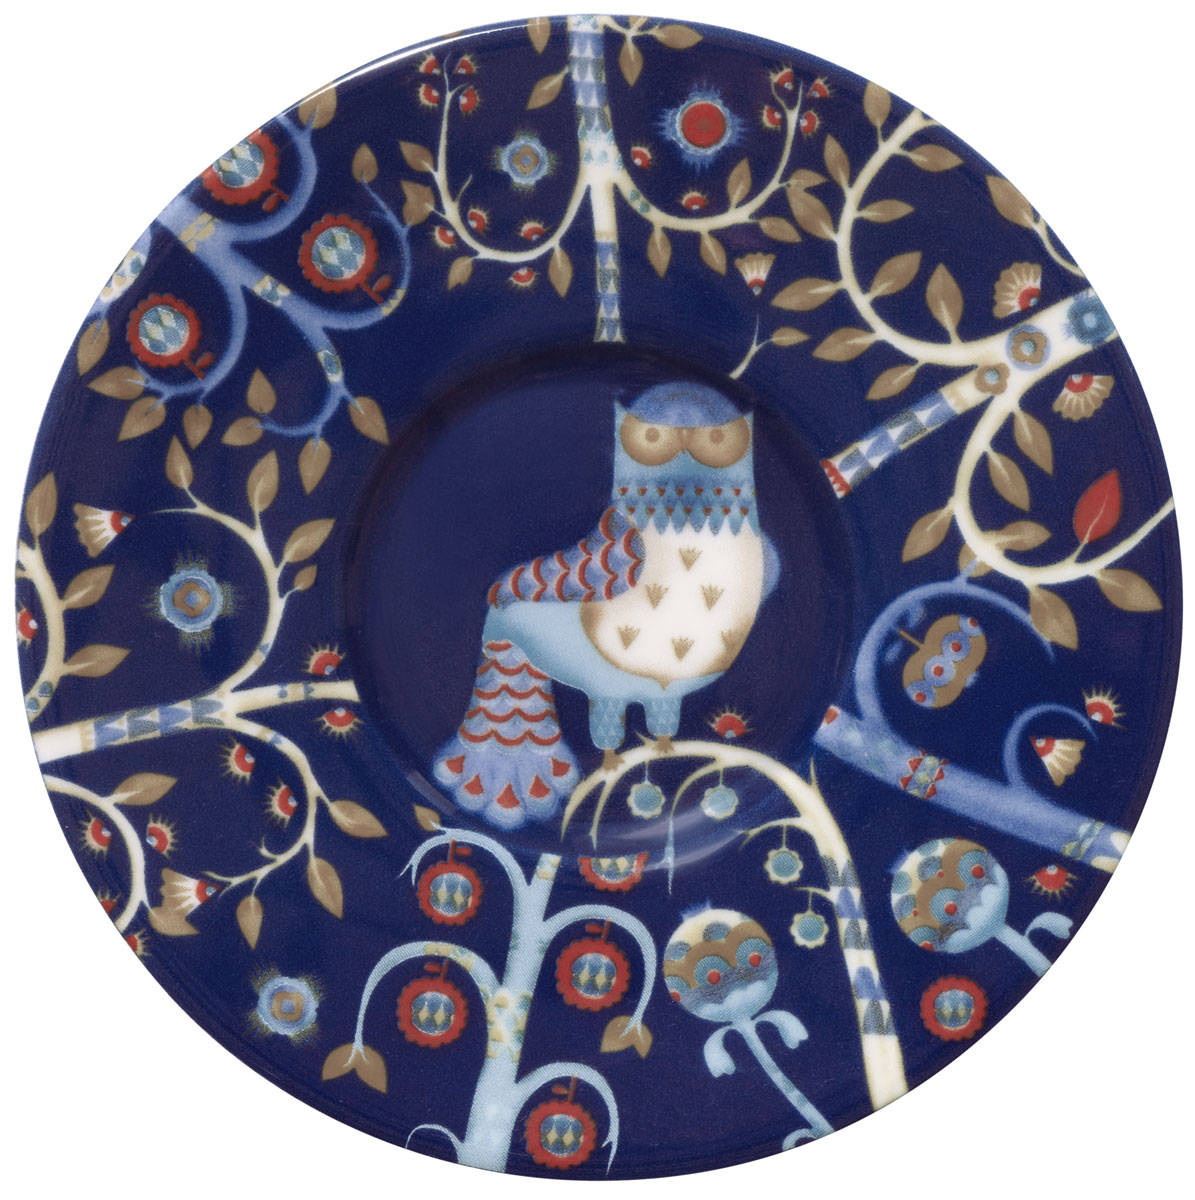 Блюдце Iittala Taika, для кофейной чашки, цвет: синий, диаметр 11 см1012448